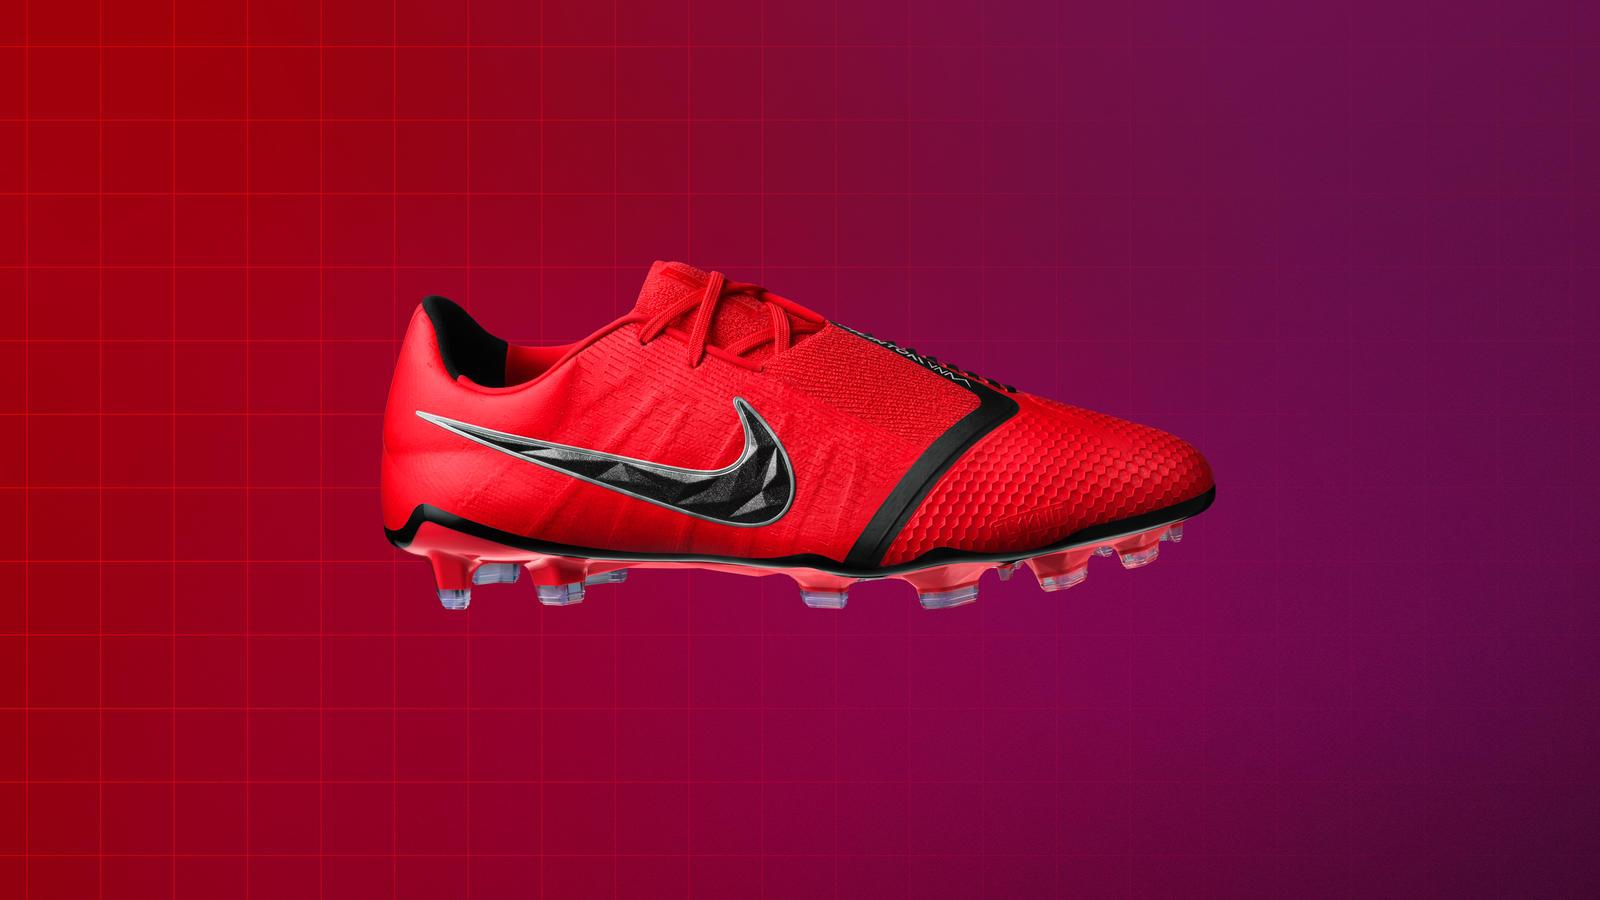 b6a212cb8 ... Click to enlarge image nike phantomvnm football boots b.jpg ...